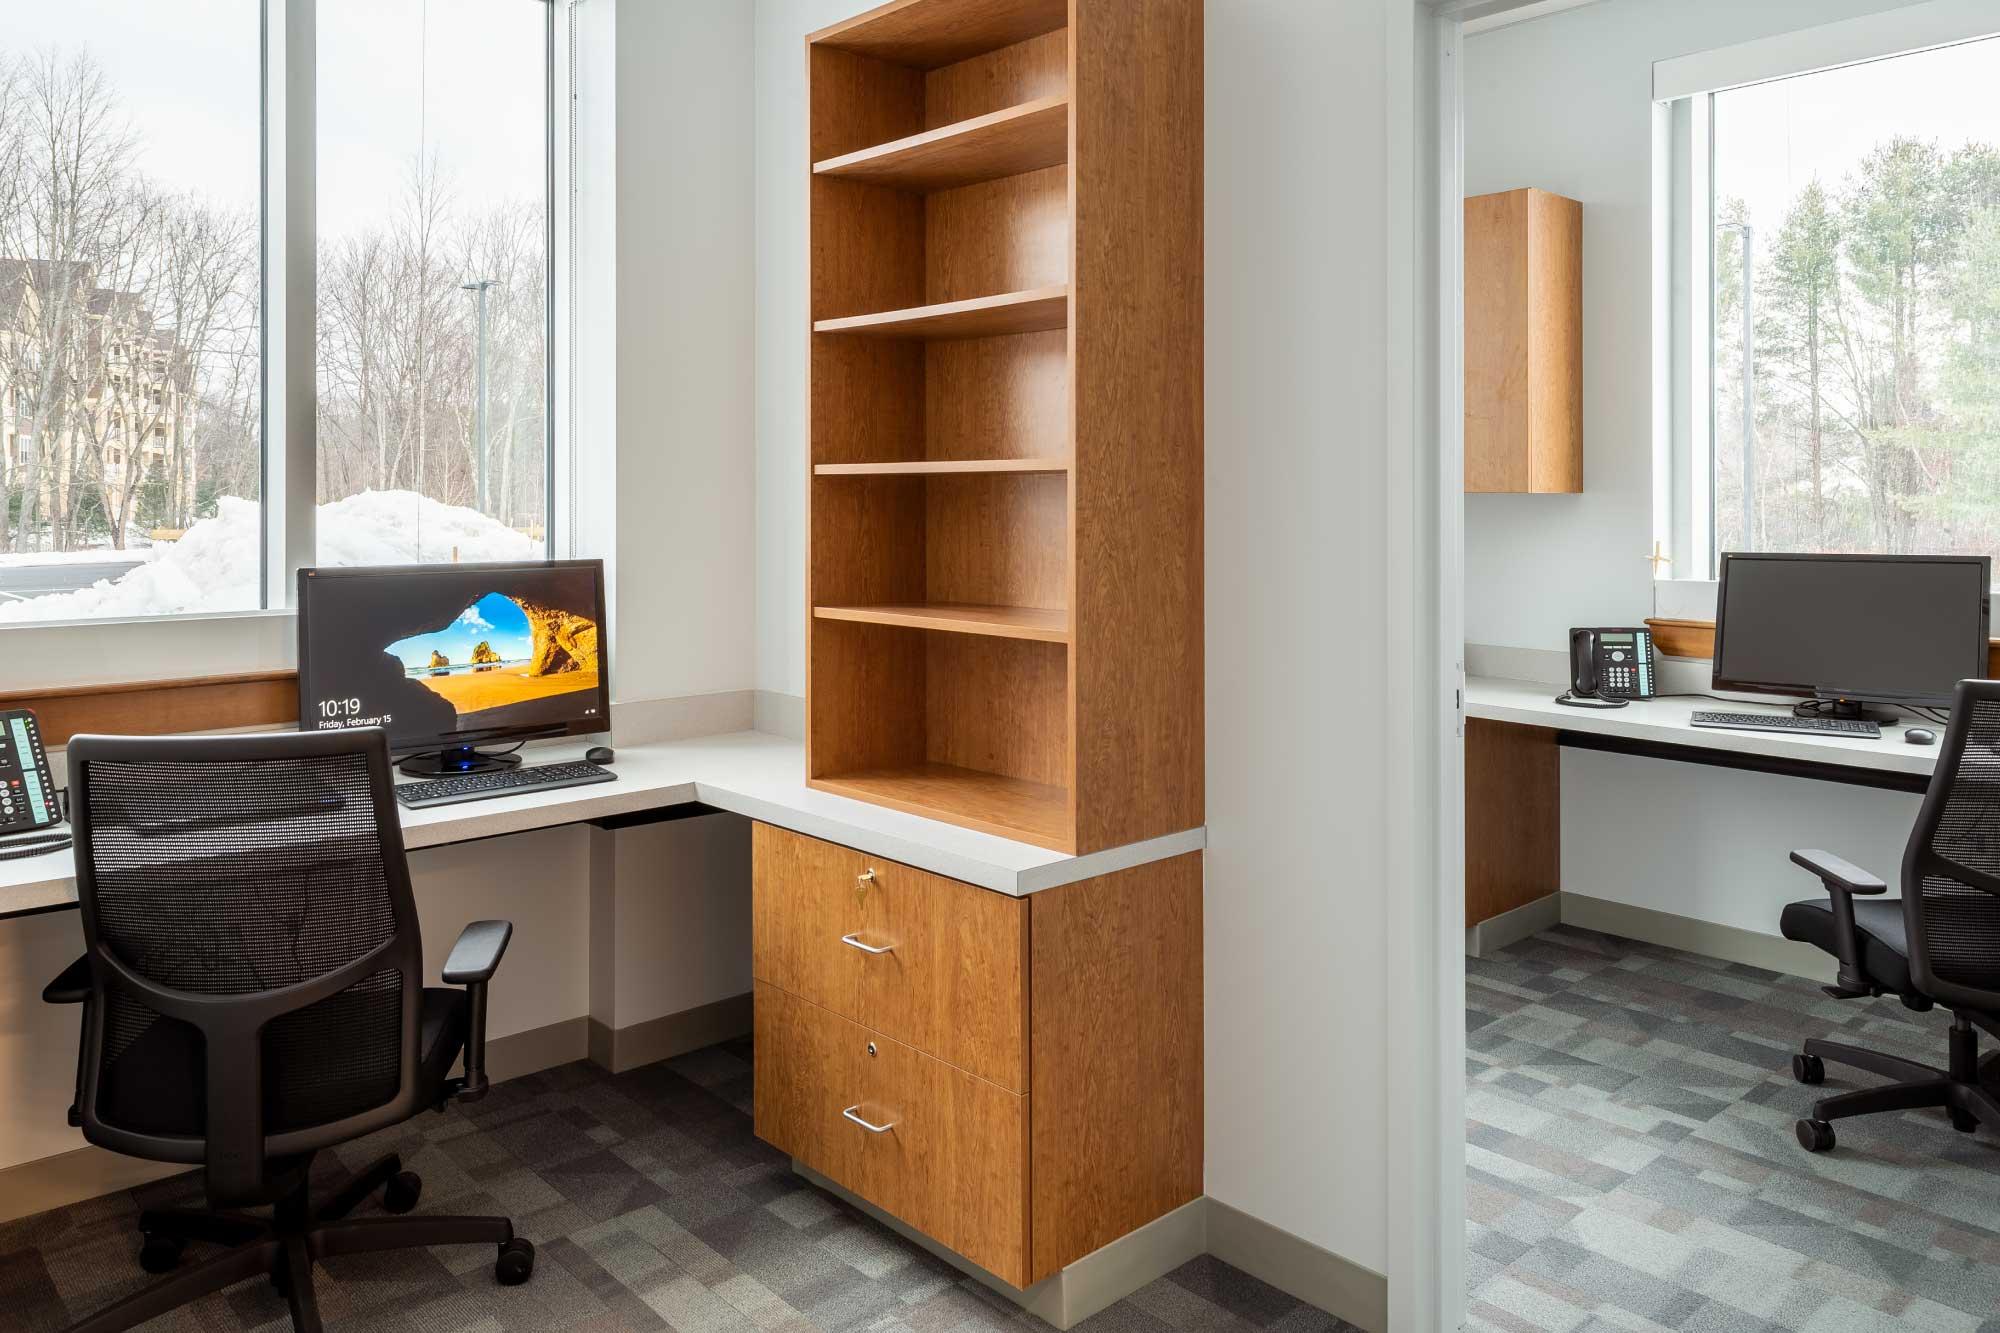 Circle Heath Tewksbury Facility Design_Nurse Practioners Office